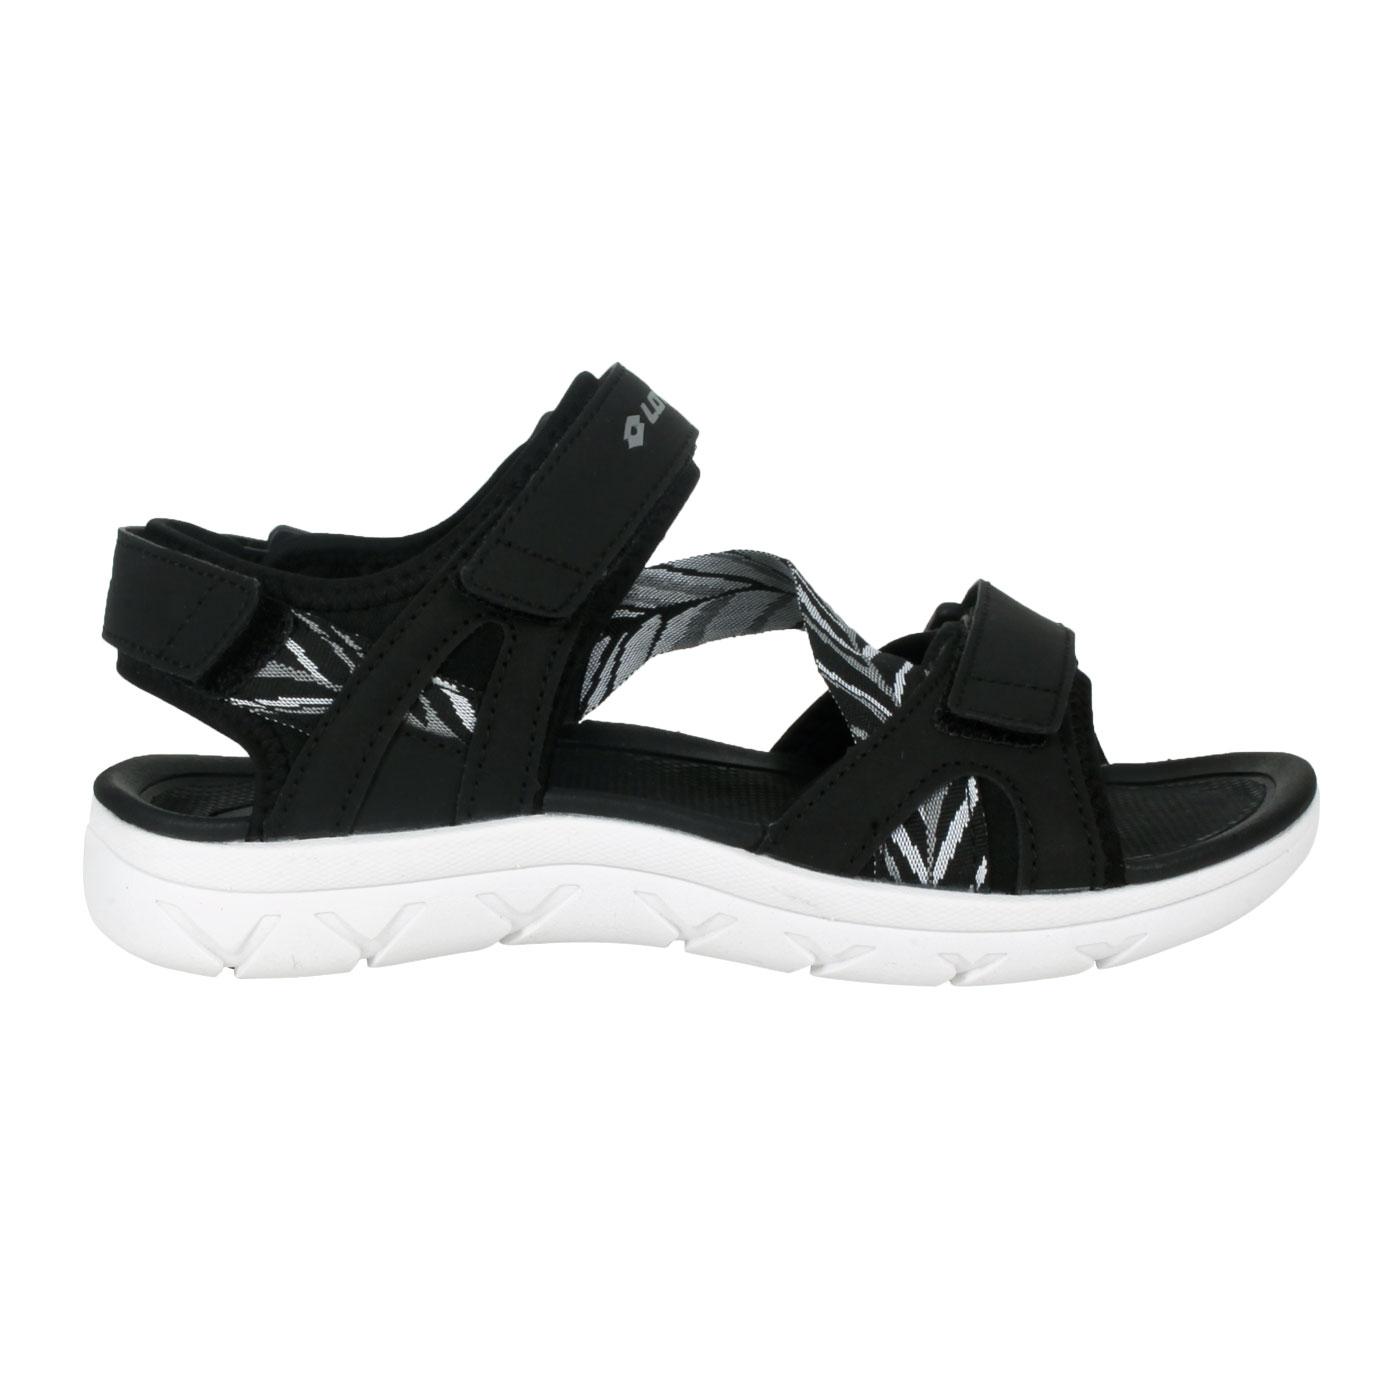 LOTTO 女款圖紋織帶涼鞋 LT1AWS3360